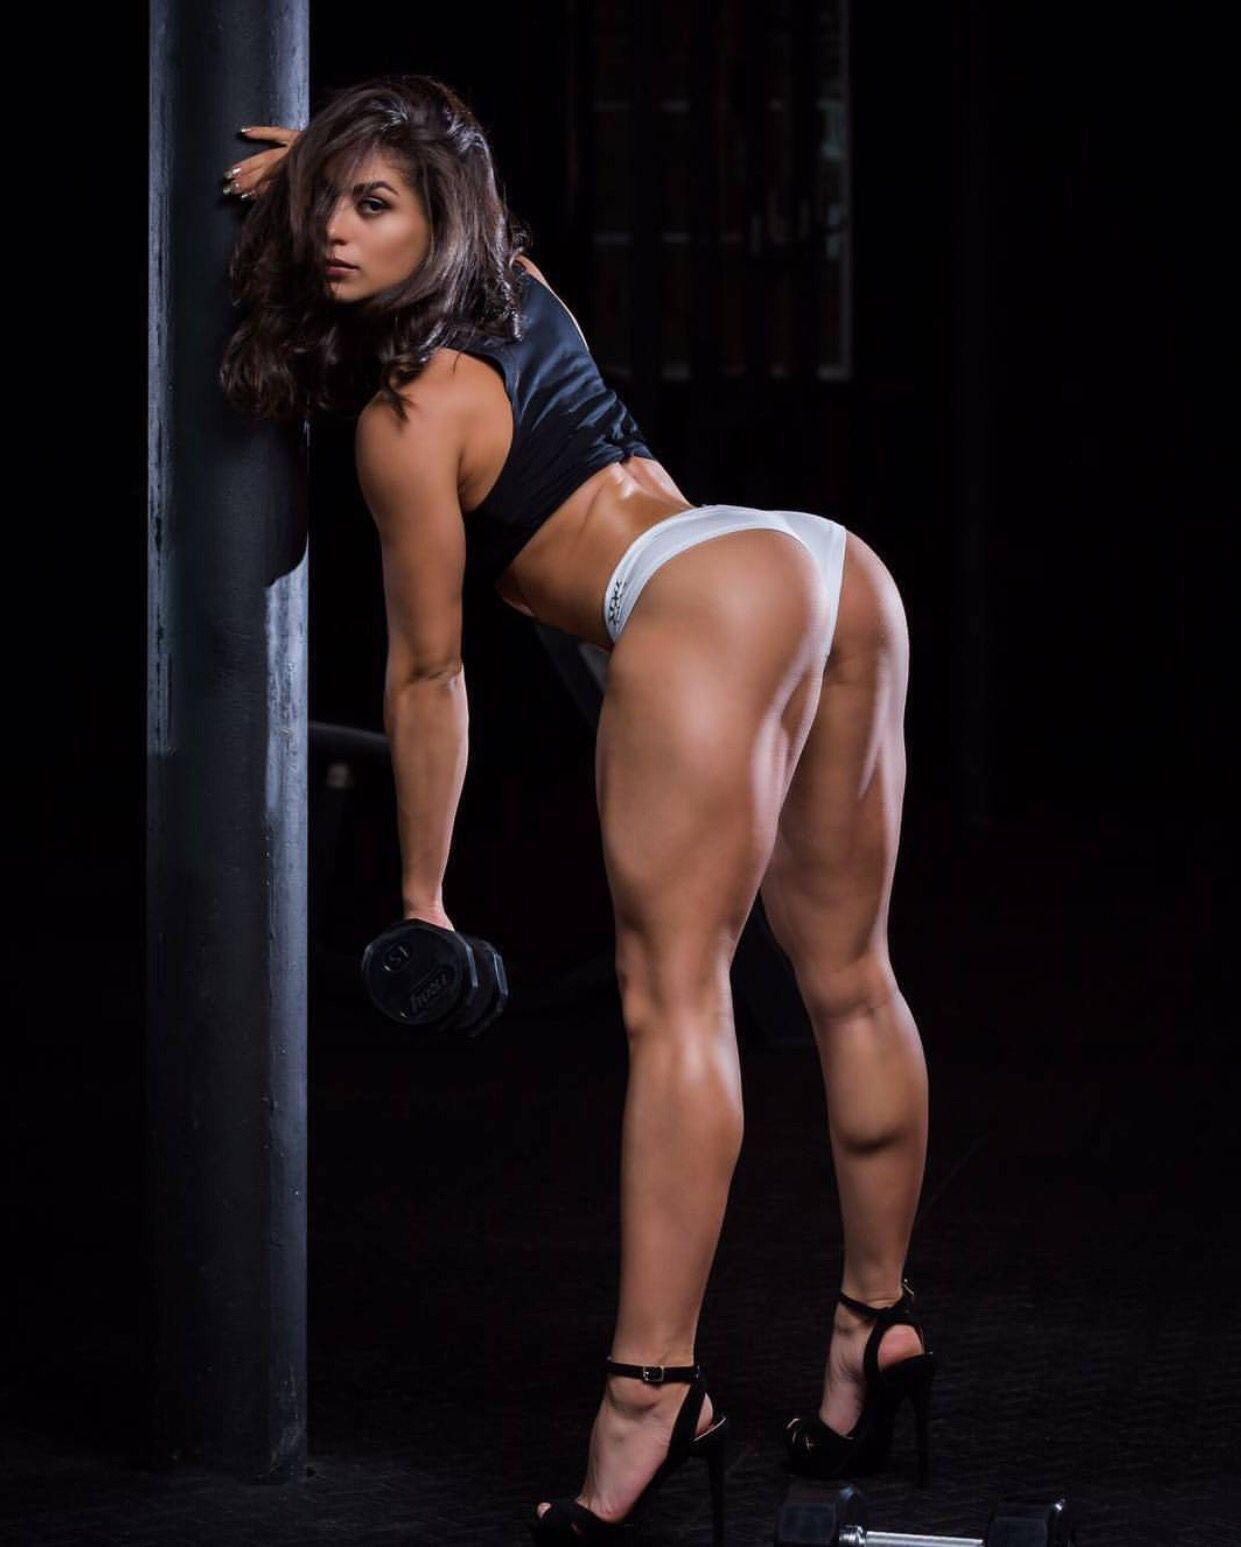 Lani blair hot legs girls, sexy leg picture, muscle pic